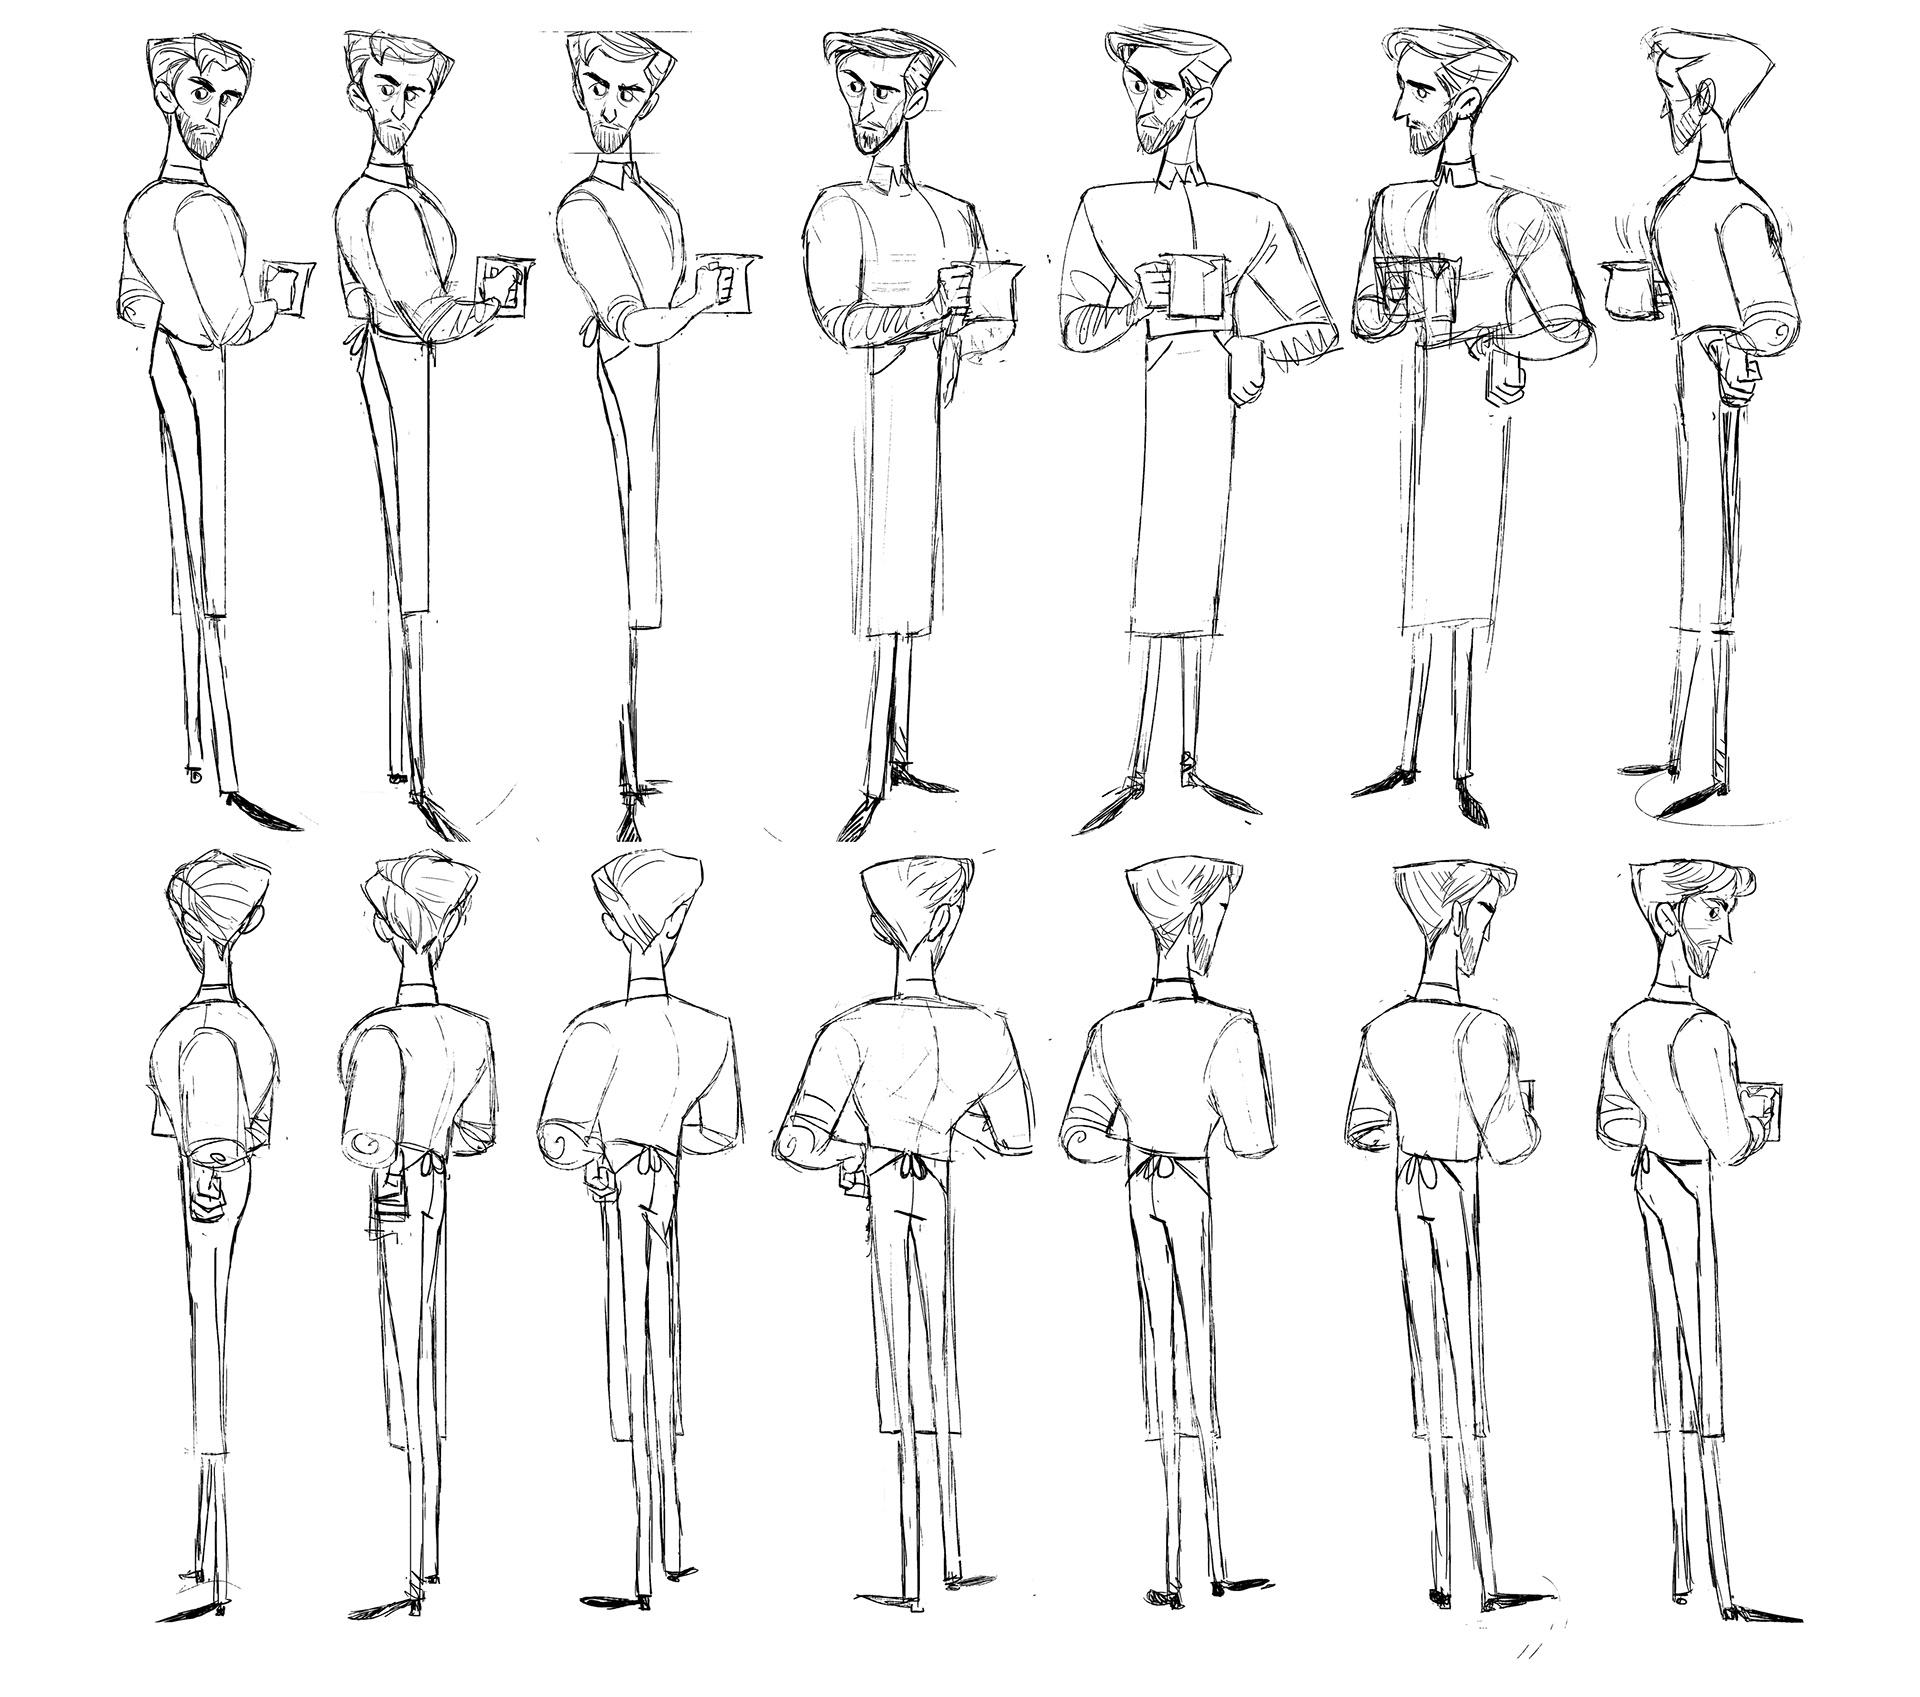 margaret spencer portfolio character design